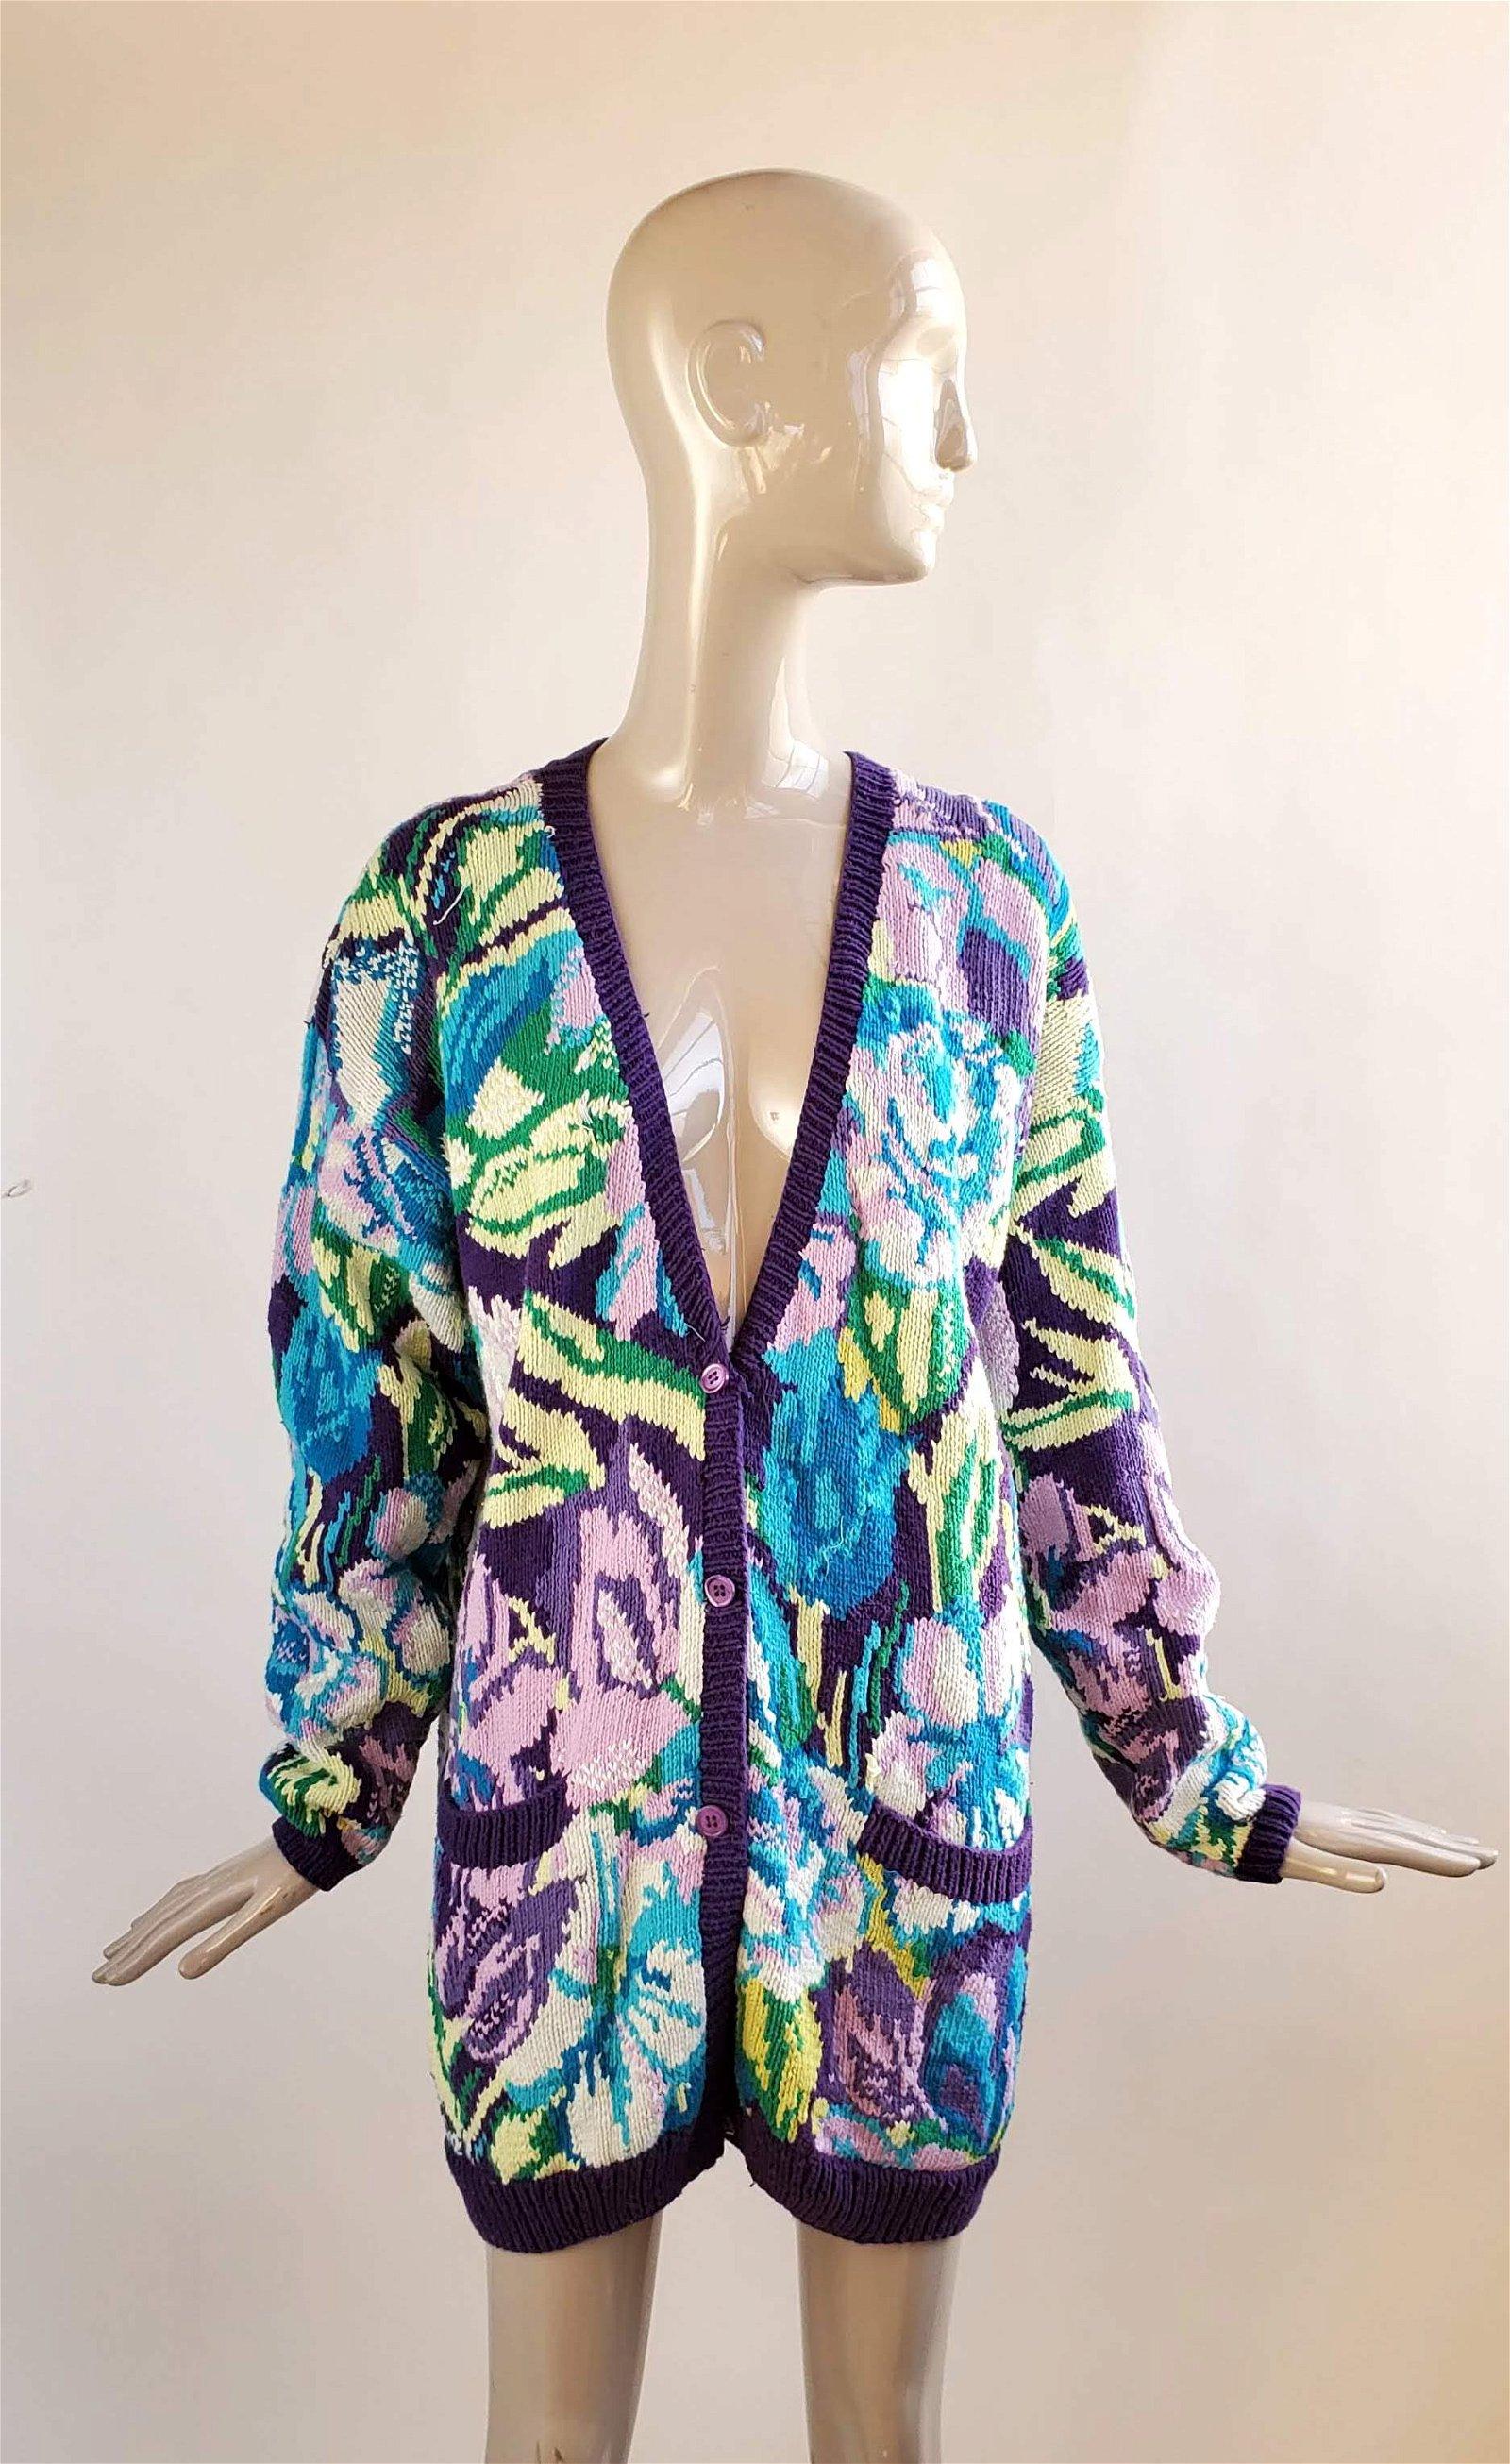 Kansai Yamamoto Floral Knit Cardigan, 1990s